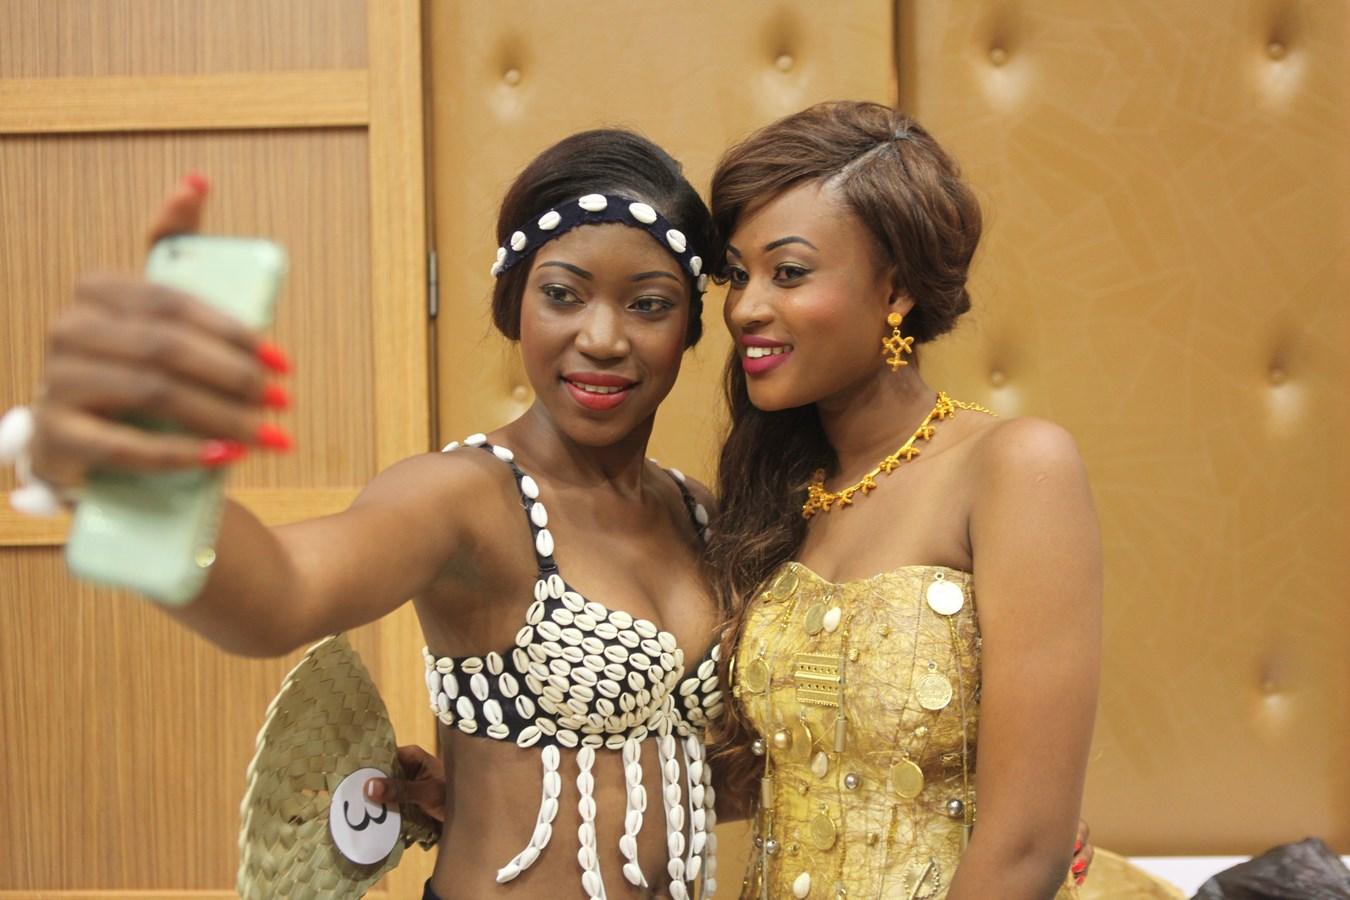 Instant selfie entre Fatima et Felicia.